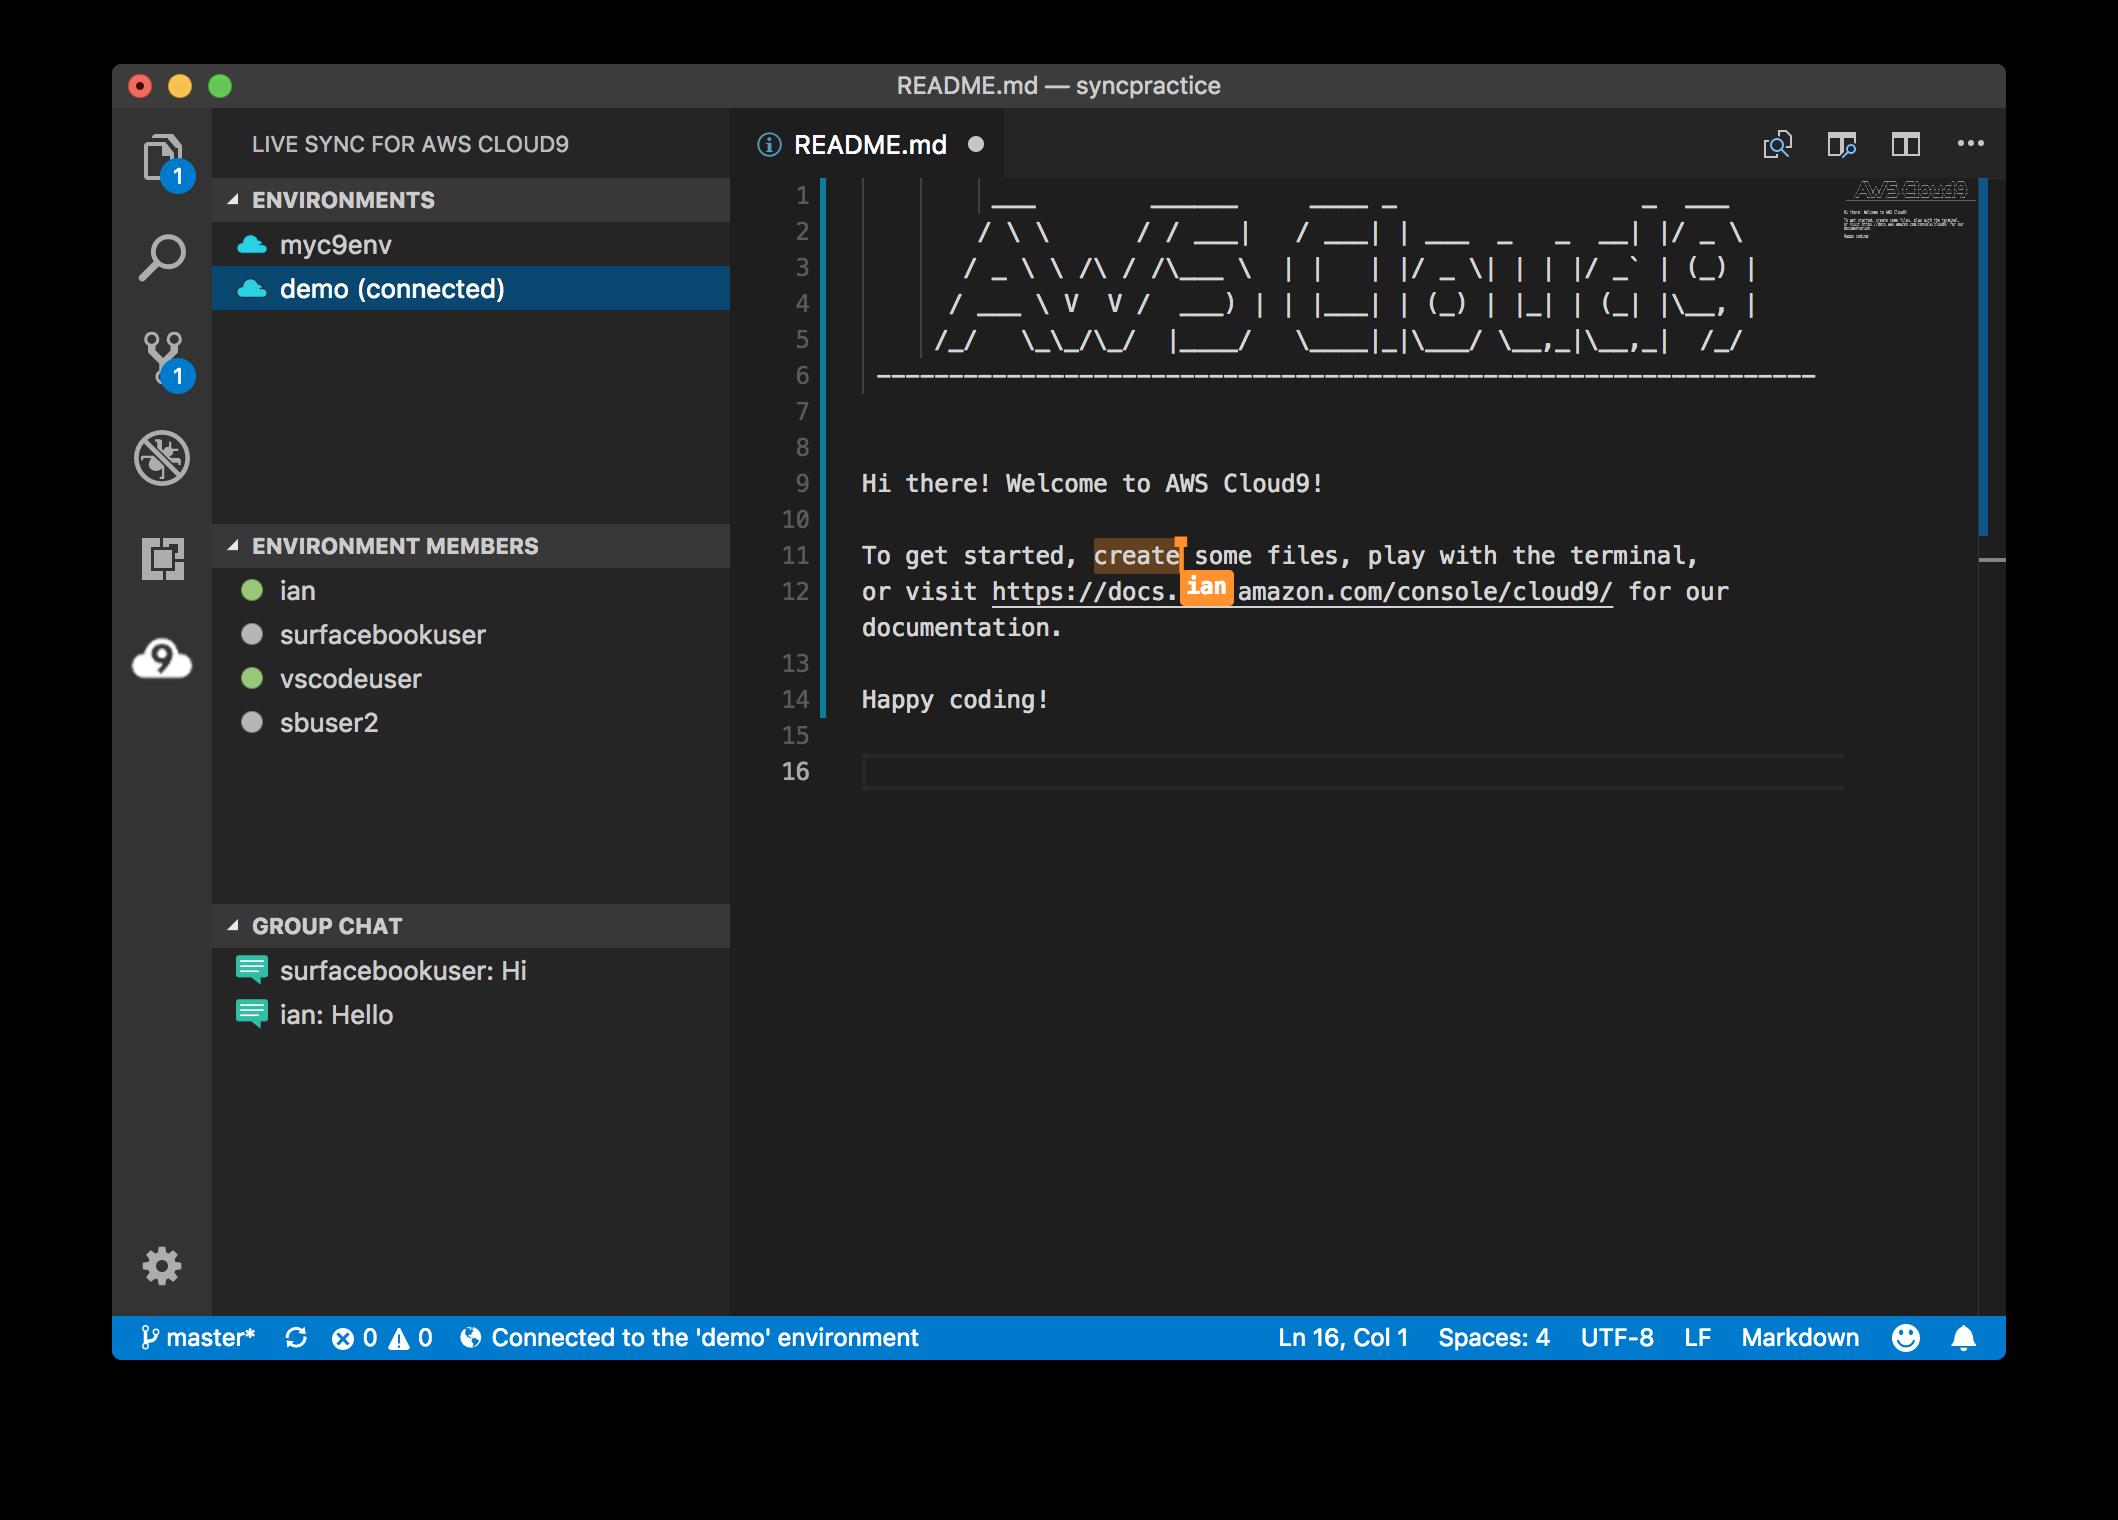 Live Sync for AWS Cloud9 Screenshot